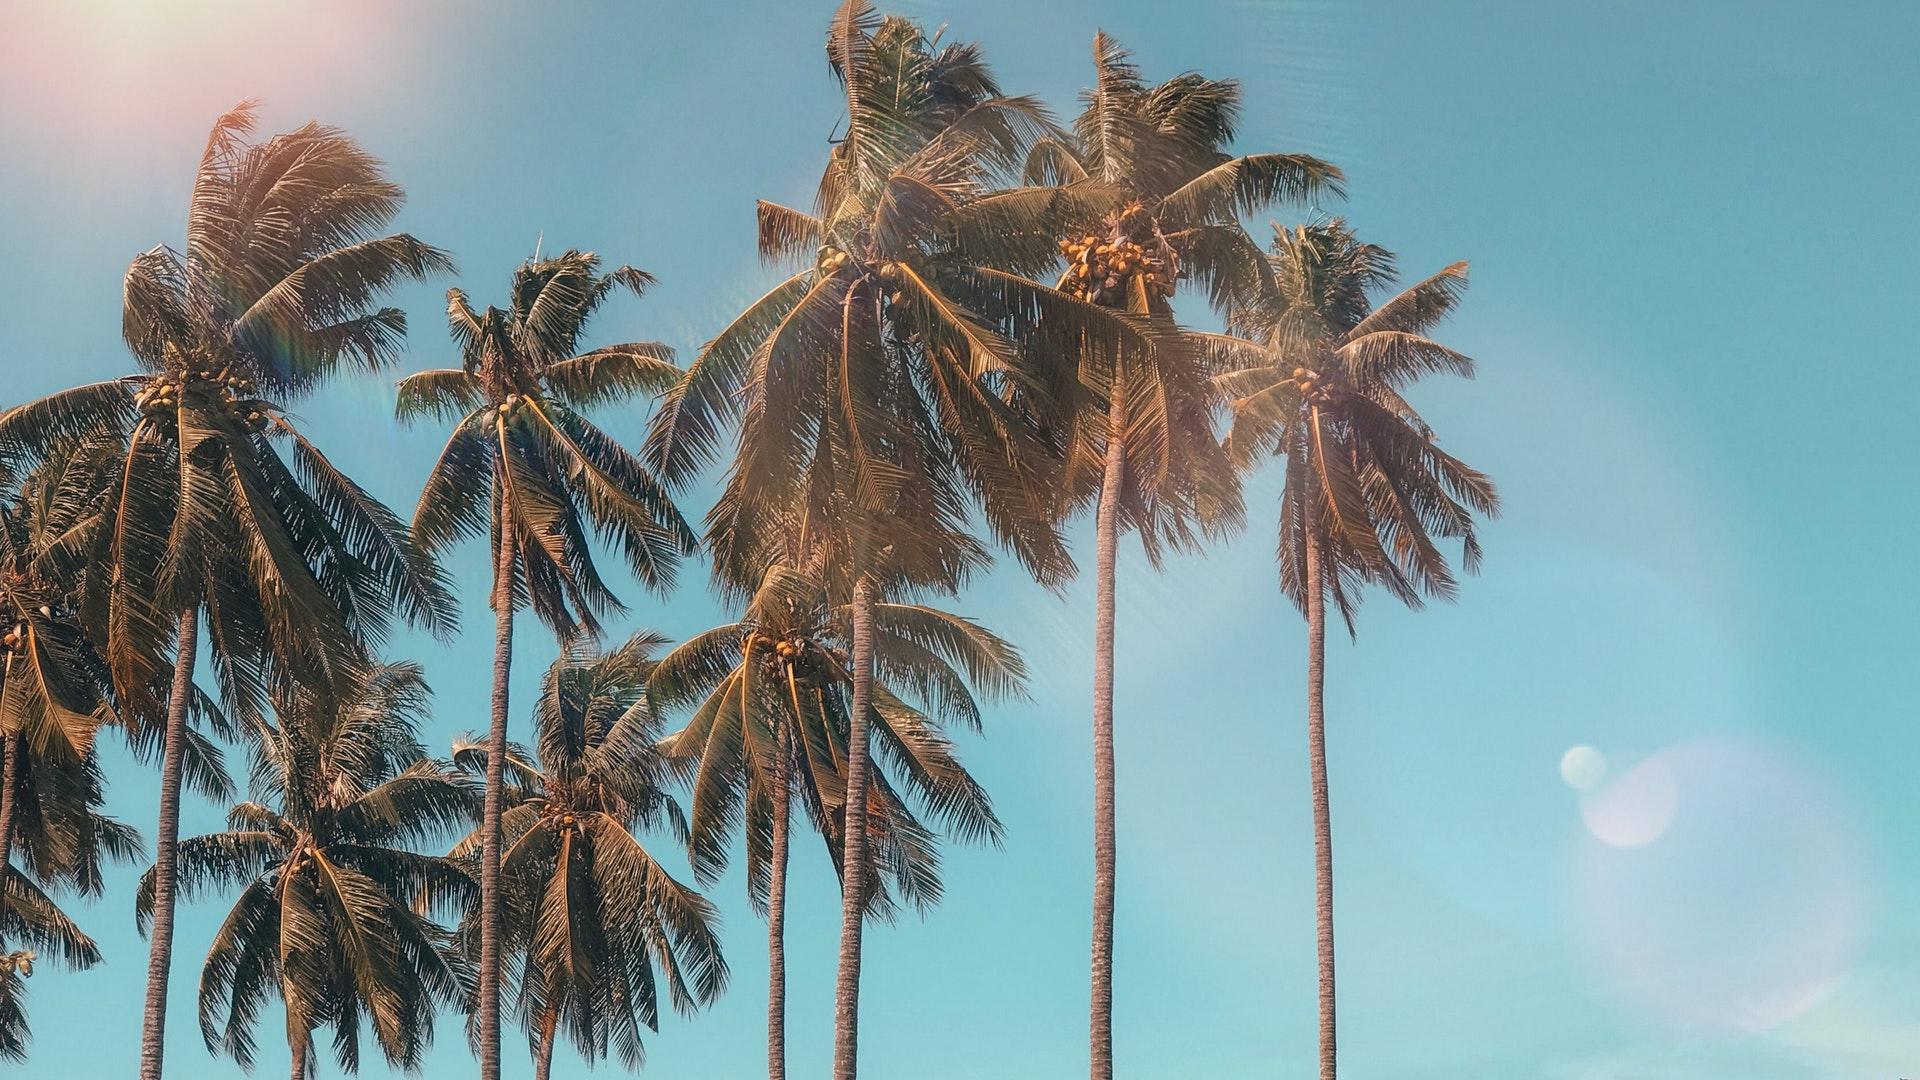 San Crisanto Beach Villas - Caban Condos - Meet Merida, Yucatán